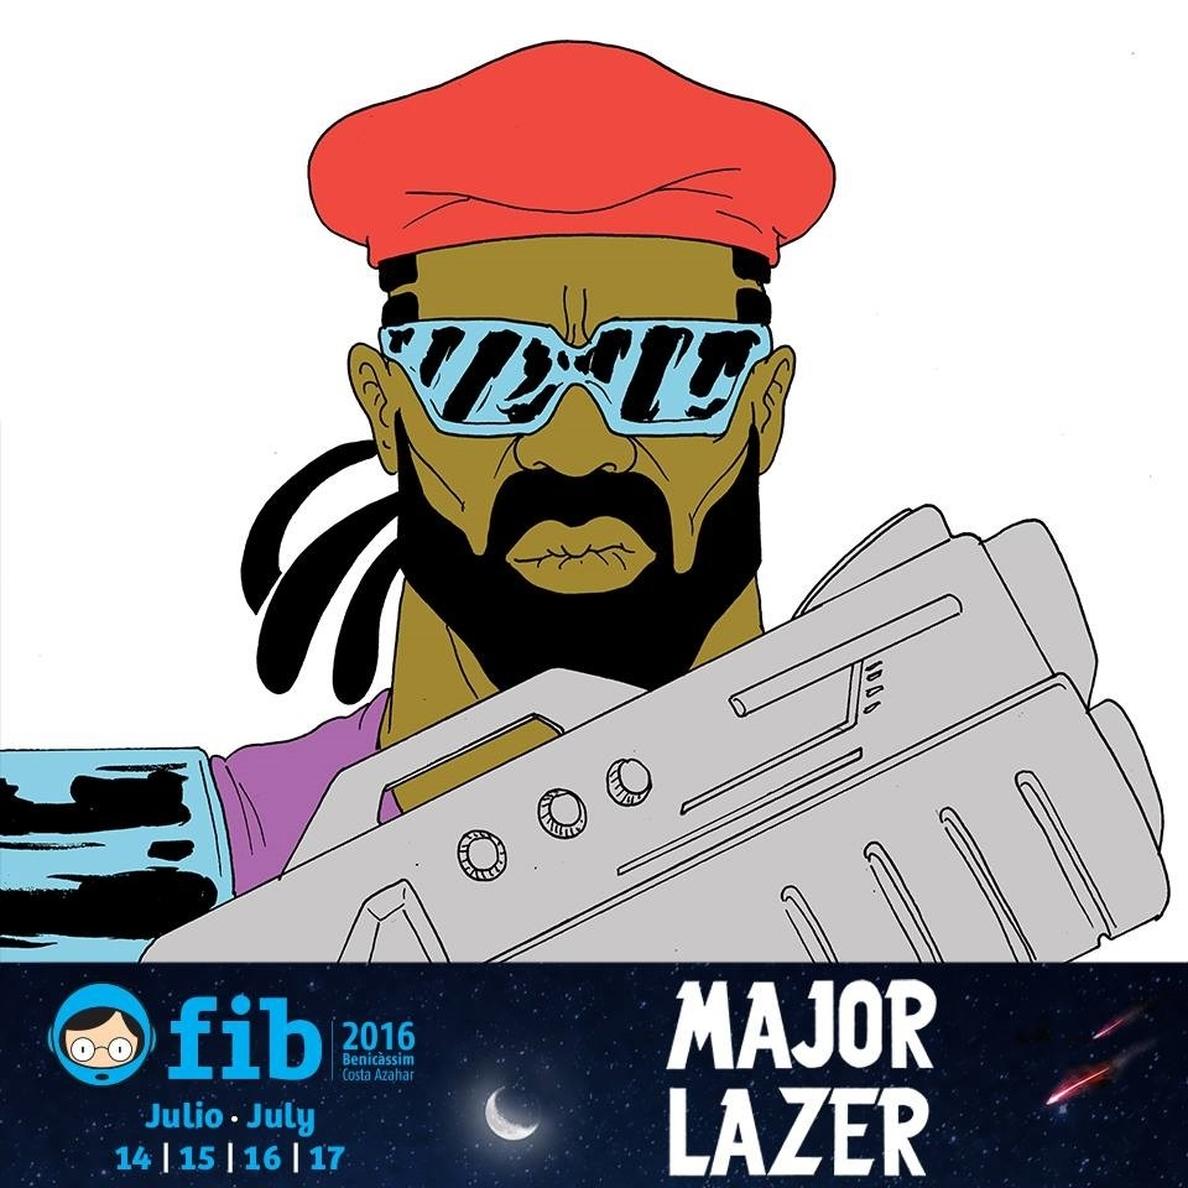 Major Lazer, primer cabeza de cartel para el Fib 2016